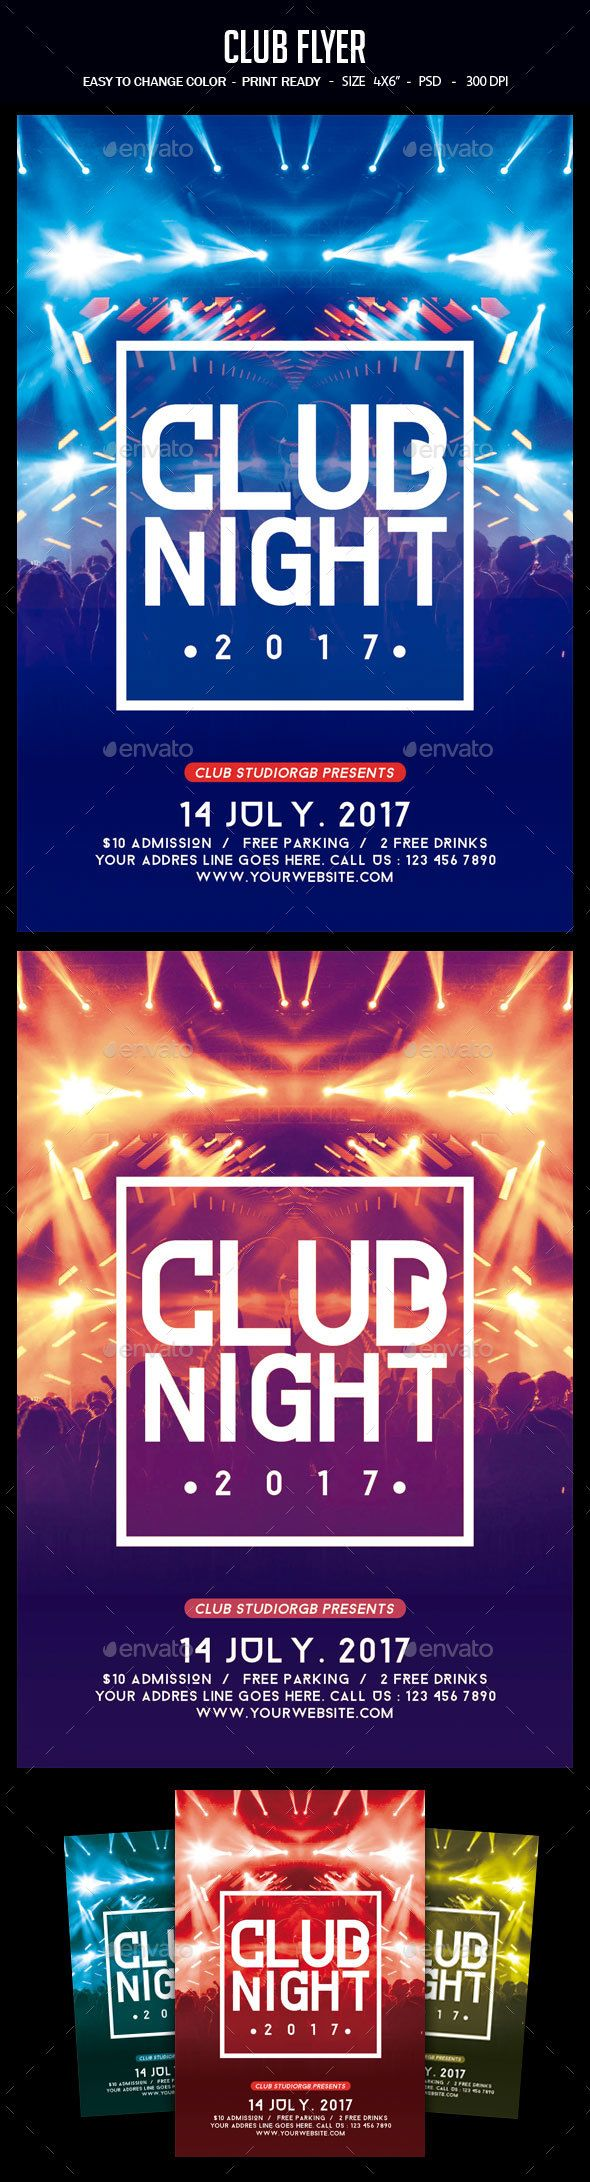 Club Flyer Template PSD